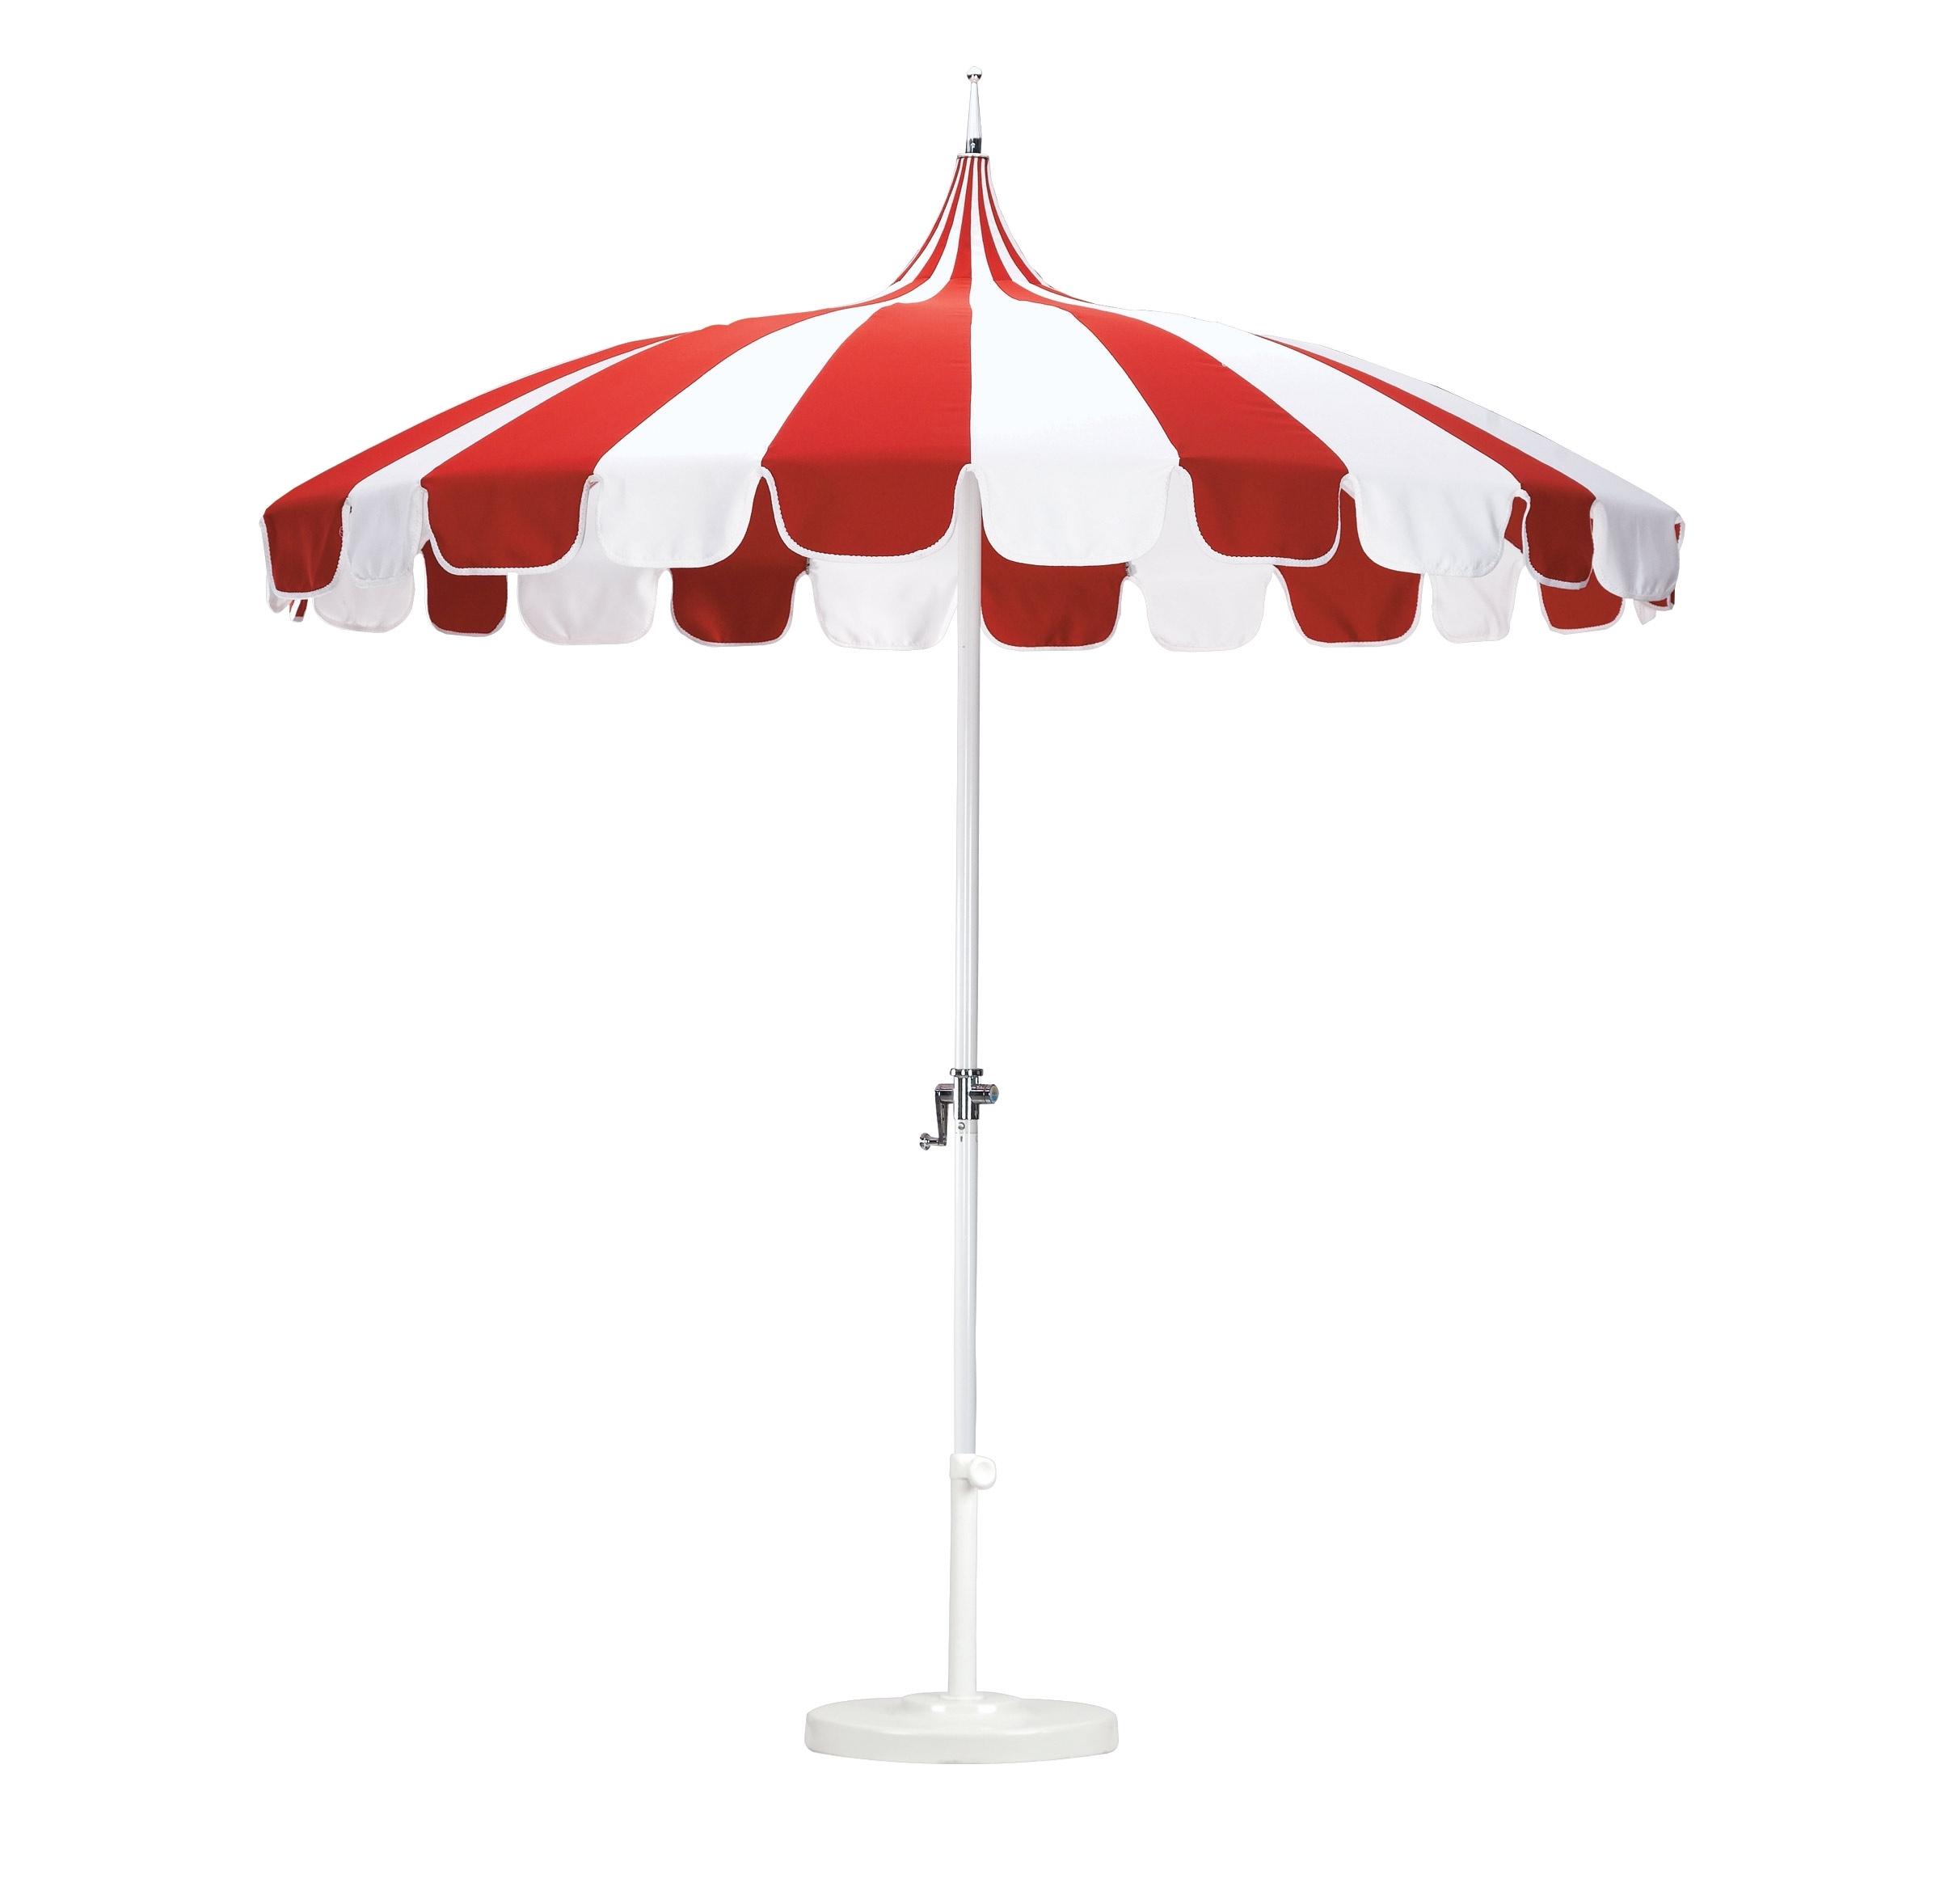 Popular Fiberglass Patio Umbrella Luxury Patio Umbrella Store Resort Inside Deluxe Patio Umbrellas (View 13 of 20)